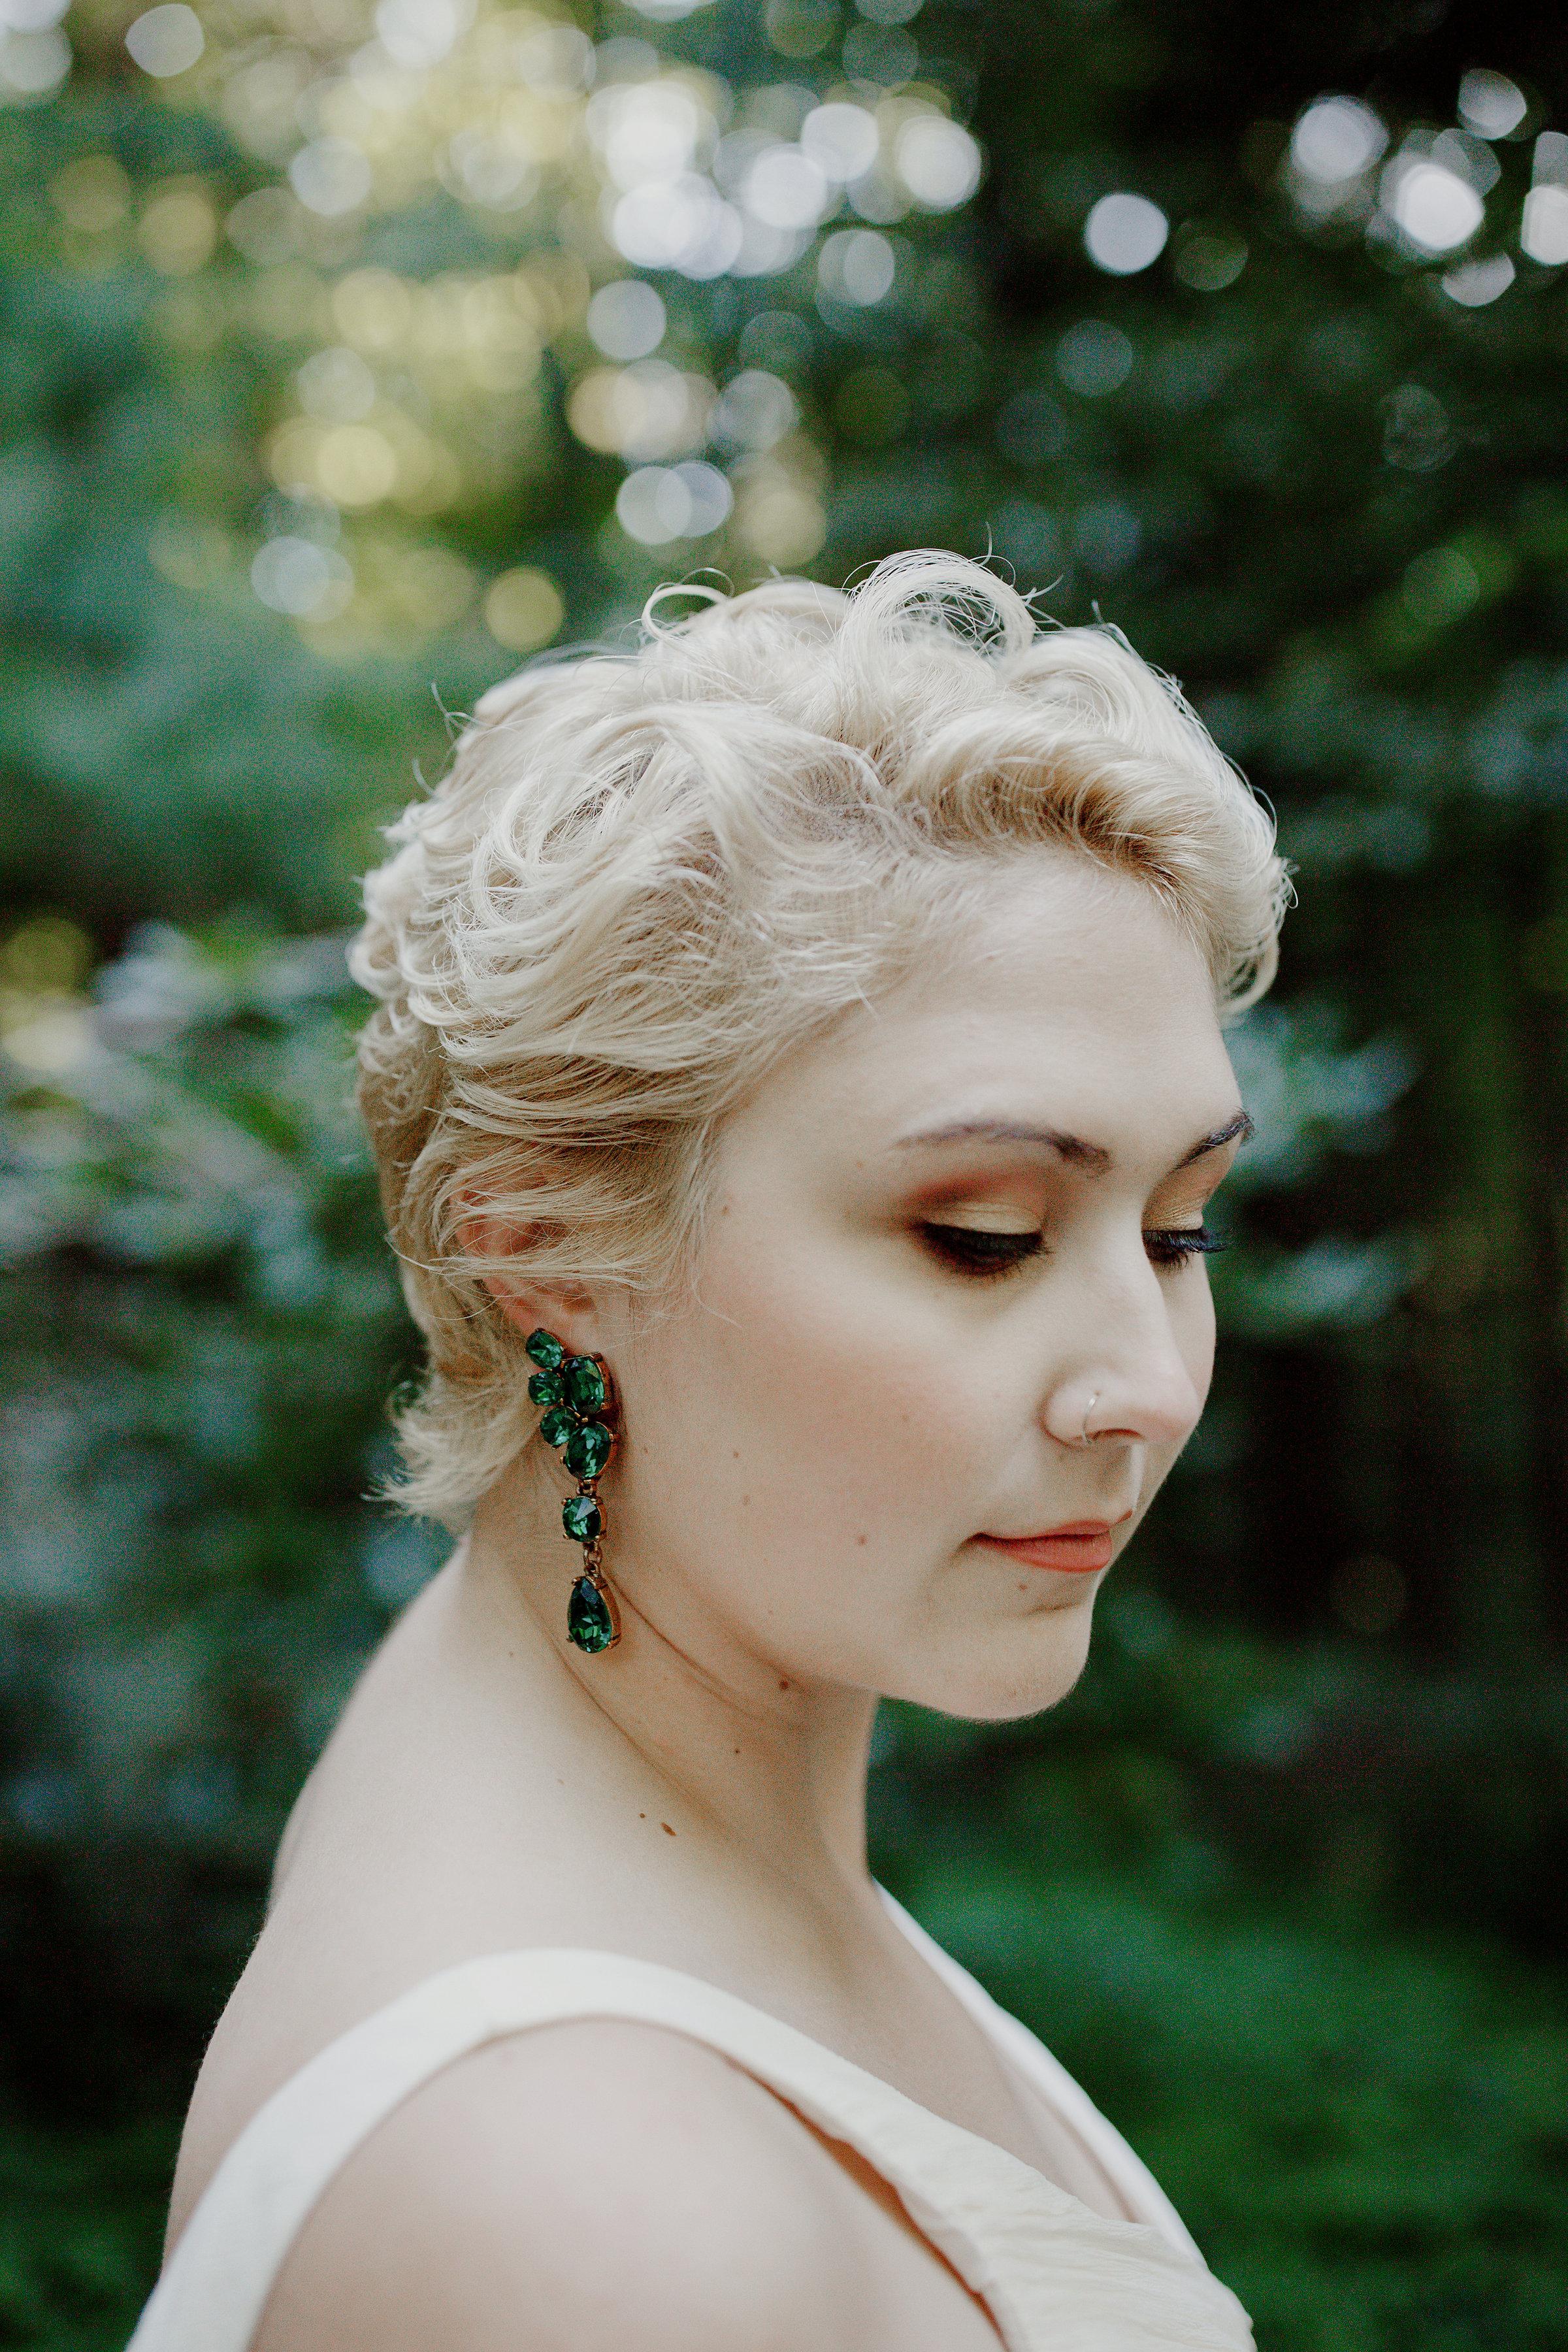 Makeup Artist - Angie Miller